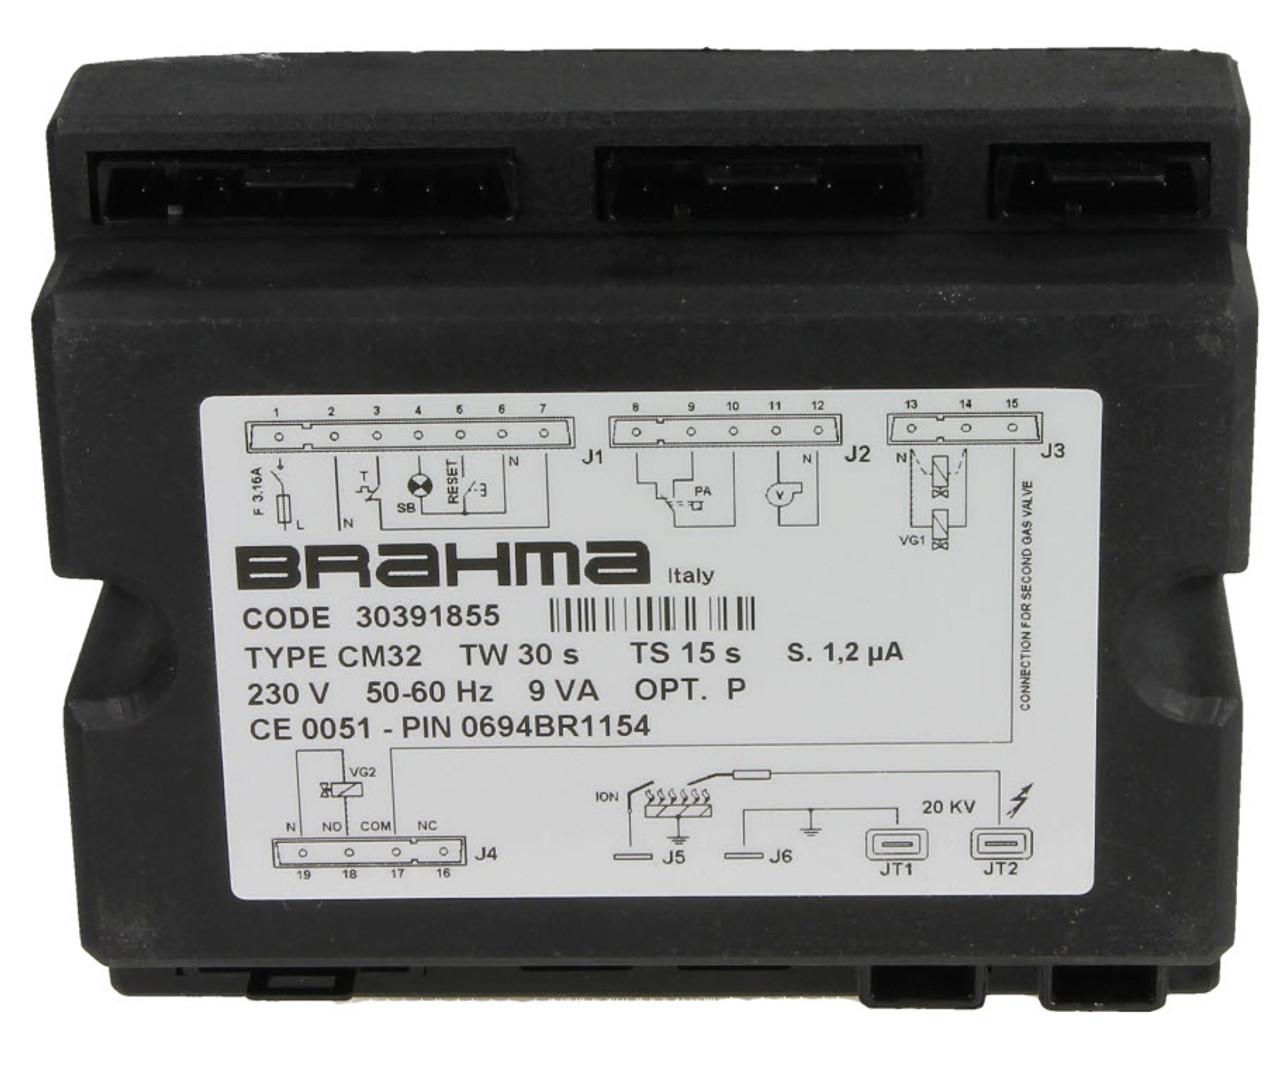 Control unit Brahma CM 32, 30391855